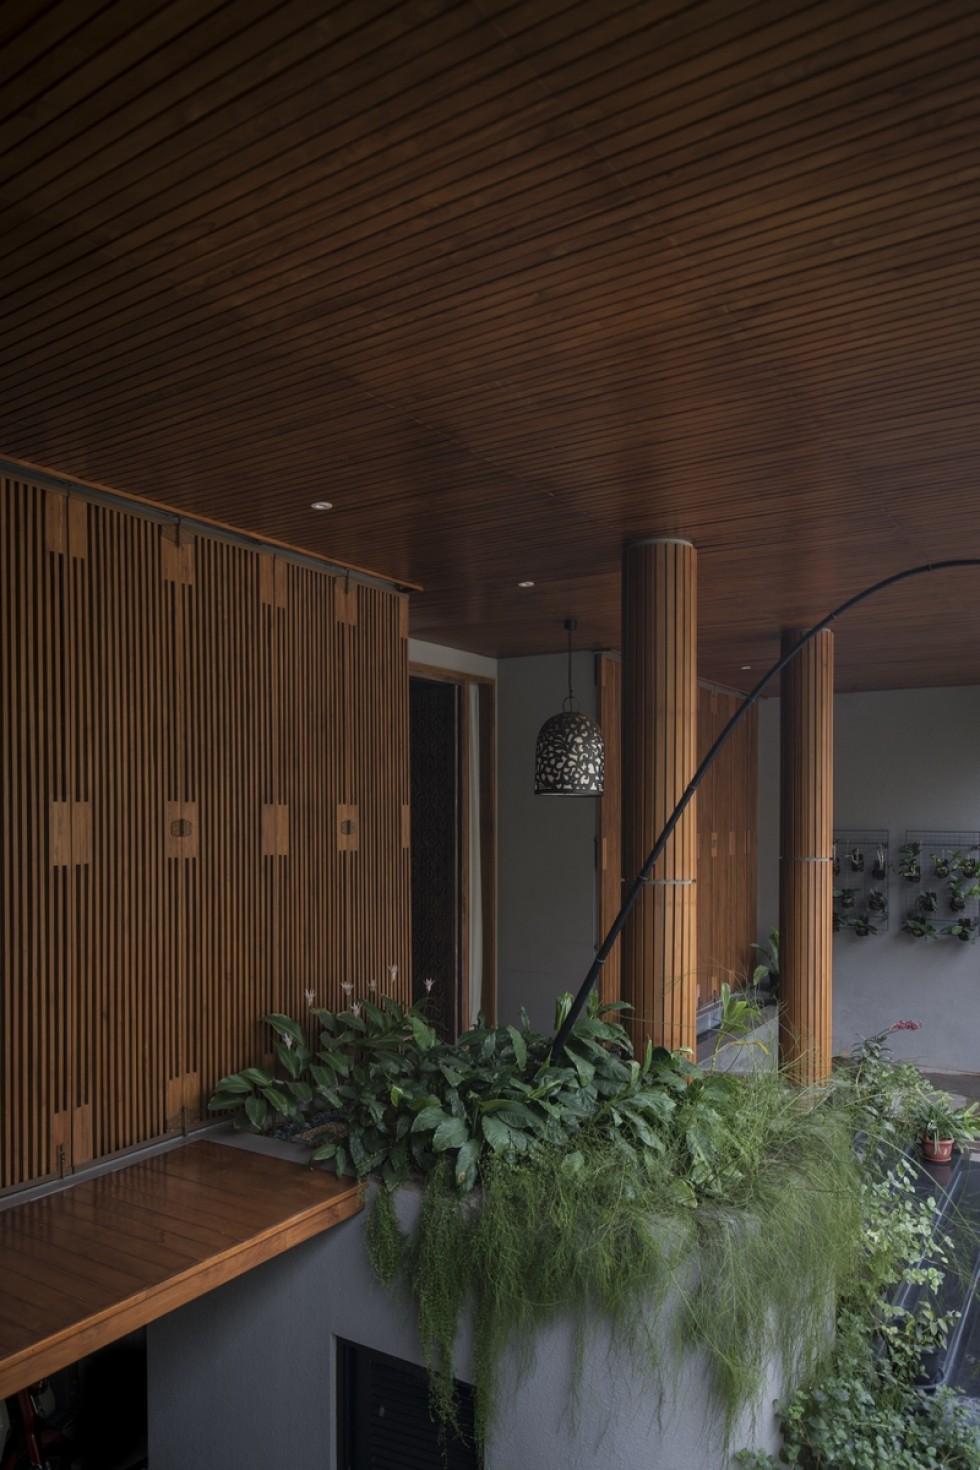 Kertanegara House